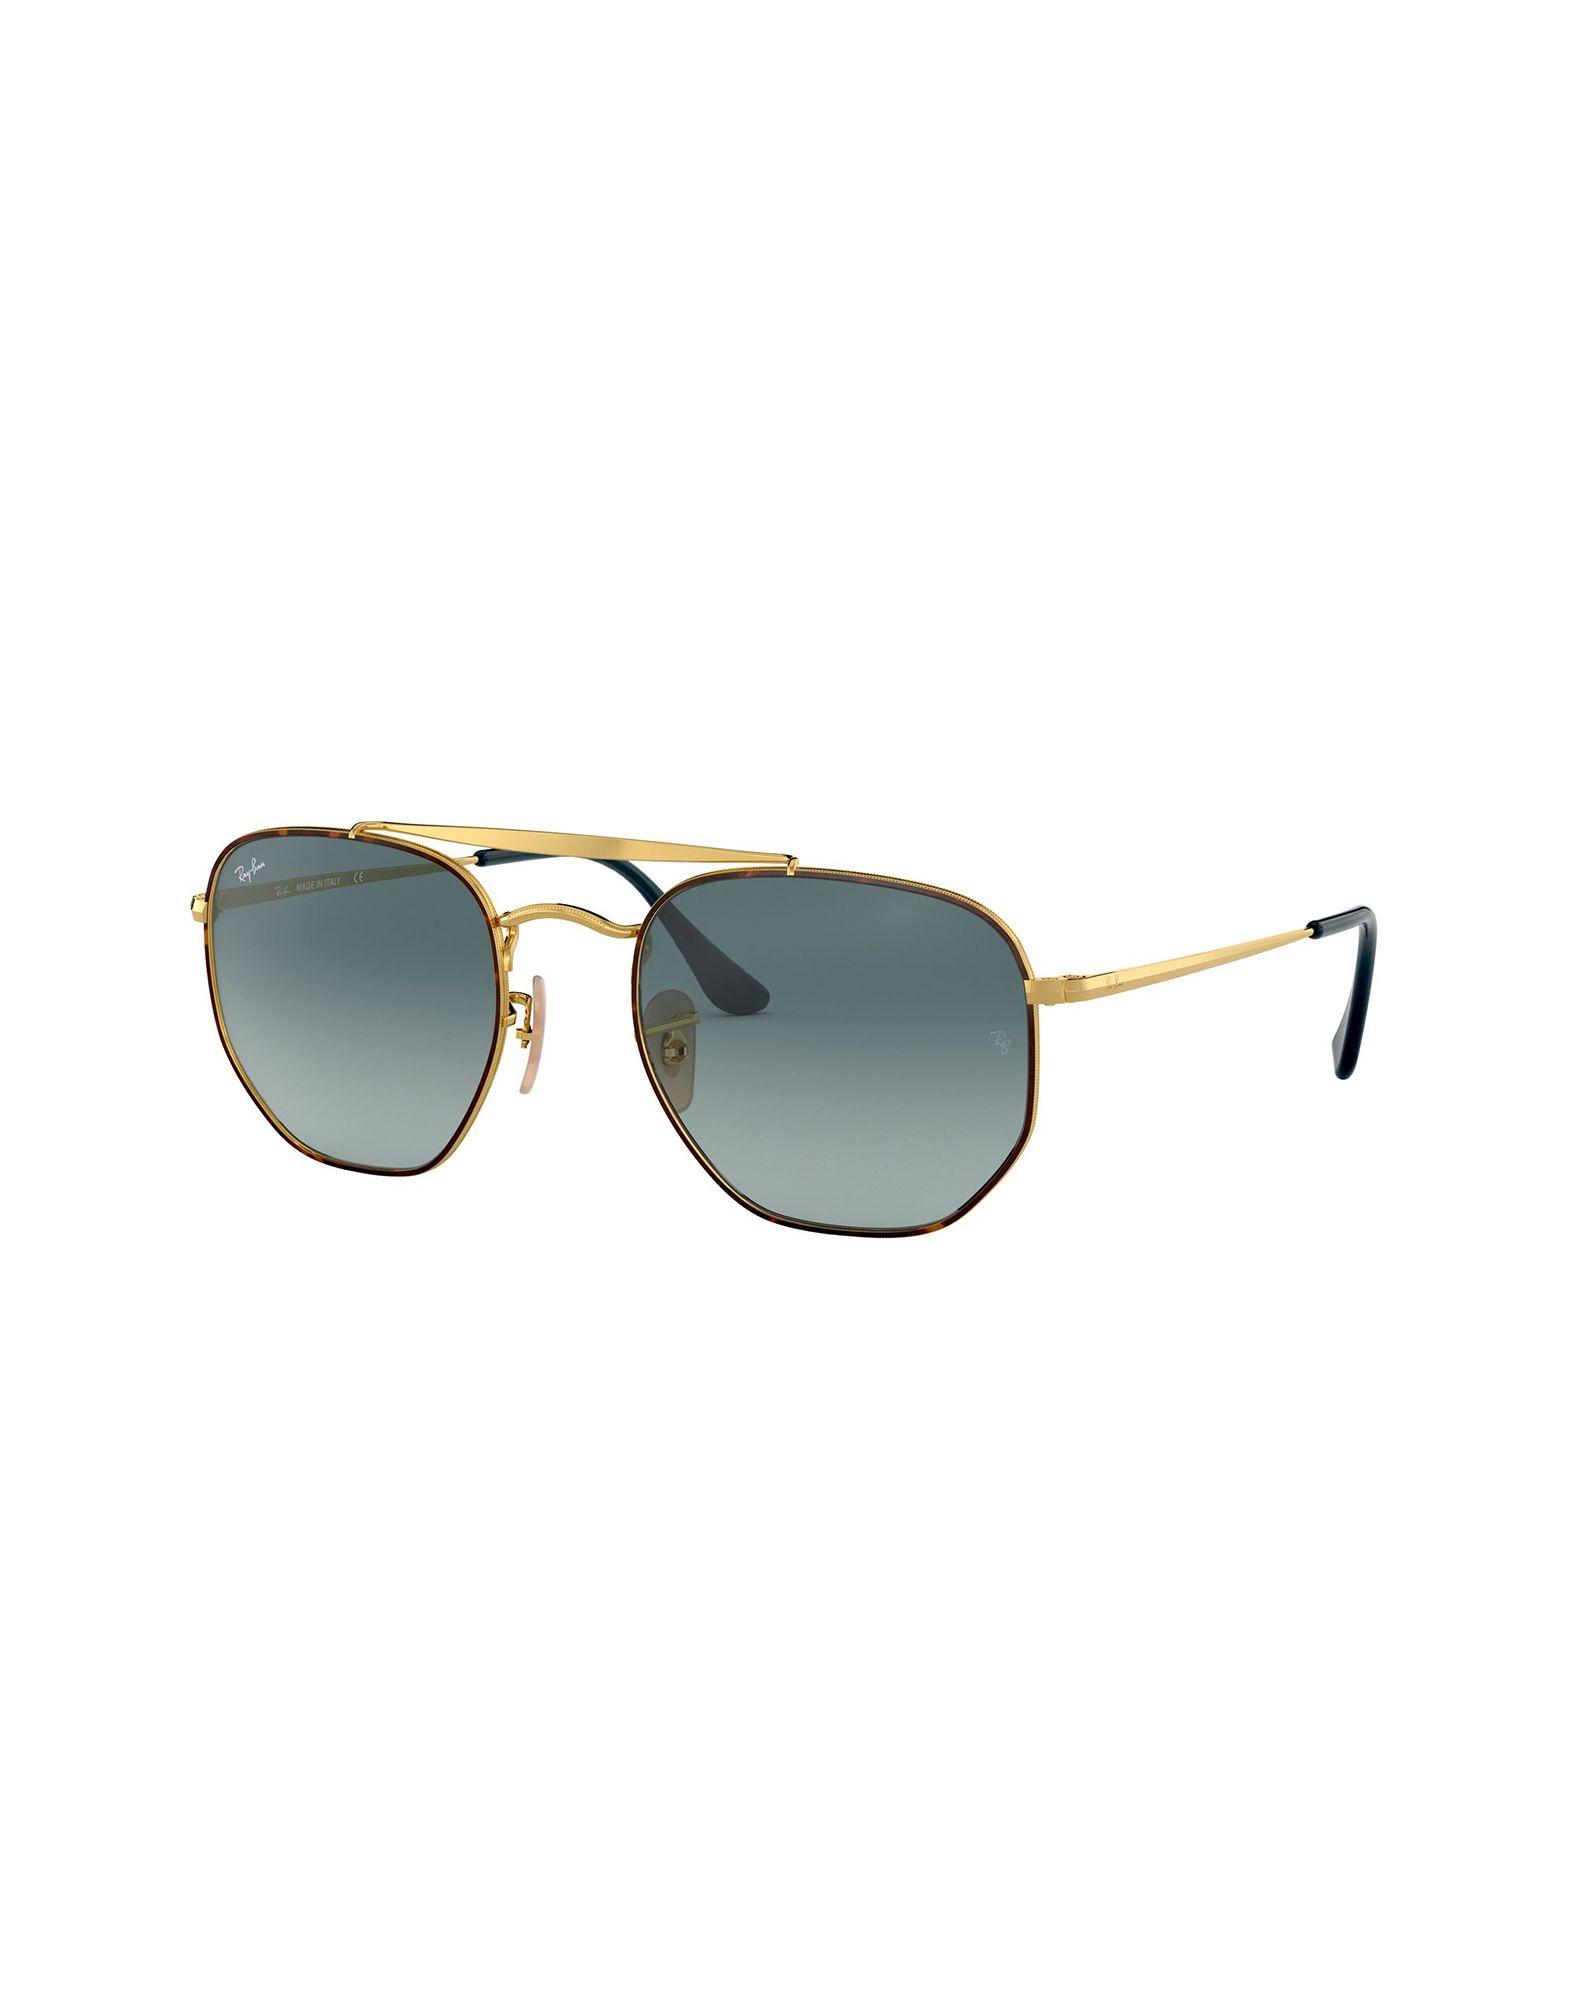 RAY-BAN Солнечные очки солнцезащитные очки ray ban rayban 3025 004 78